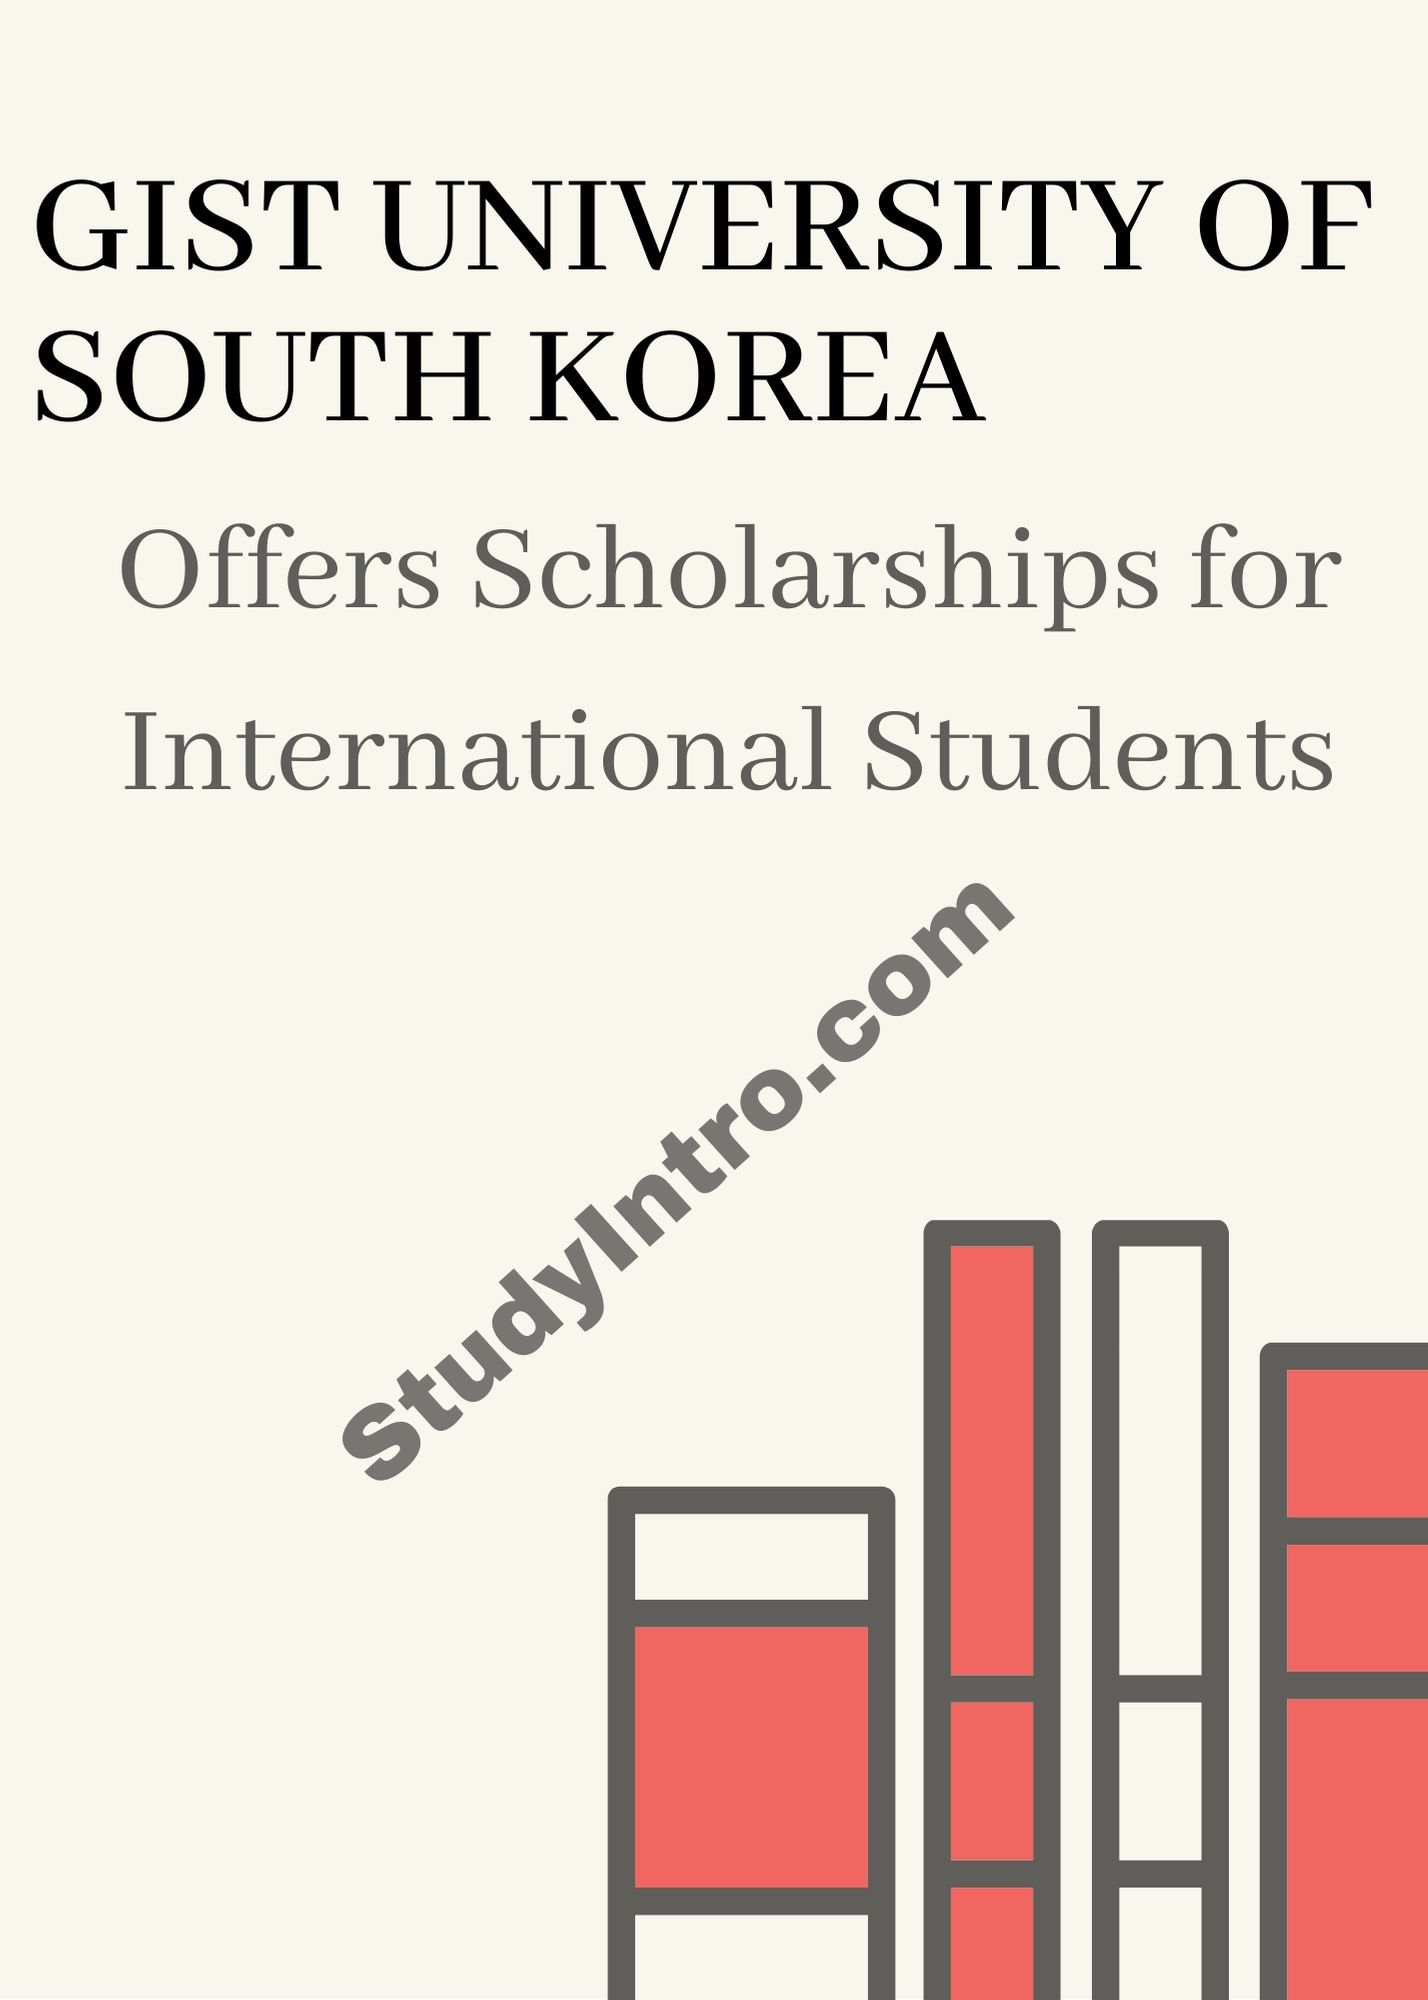 GIST university of South Korea